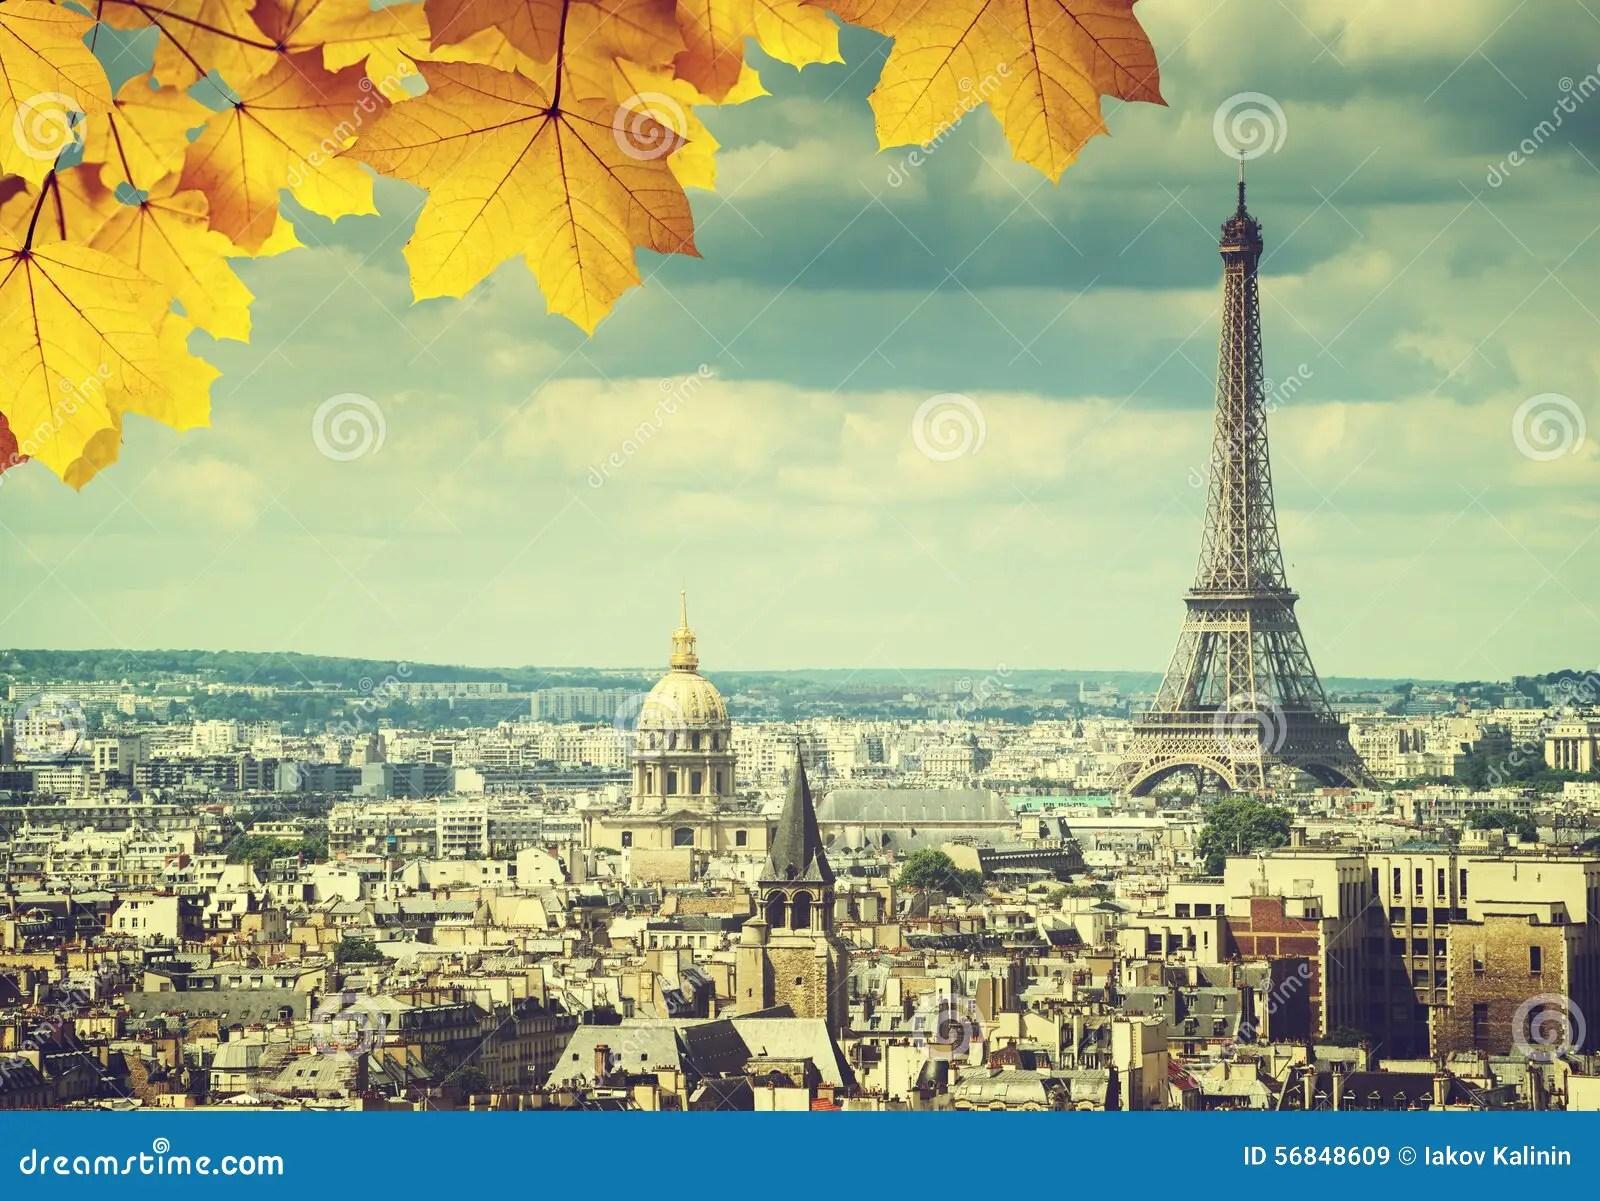 Fall Season Wallpaper Free Autumn Leaves In Paris And Eiffel Tower Stock Photo